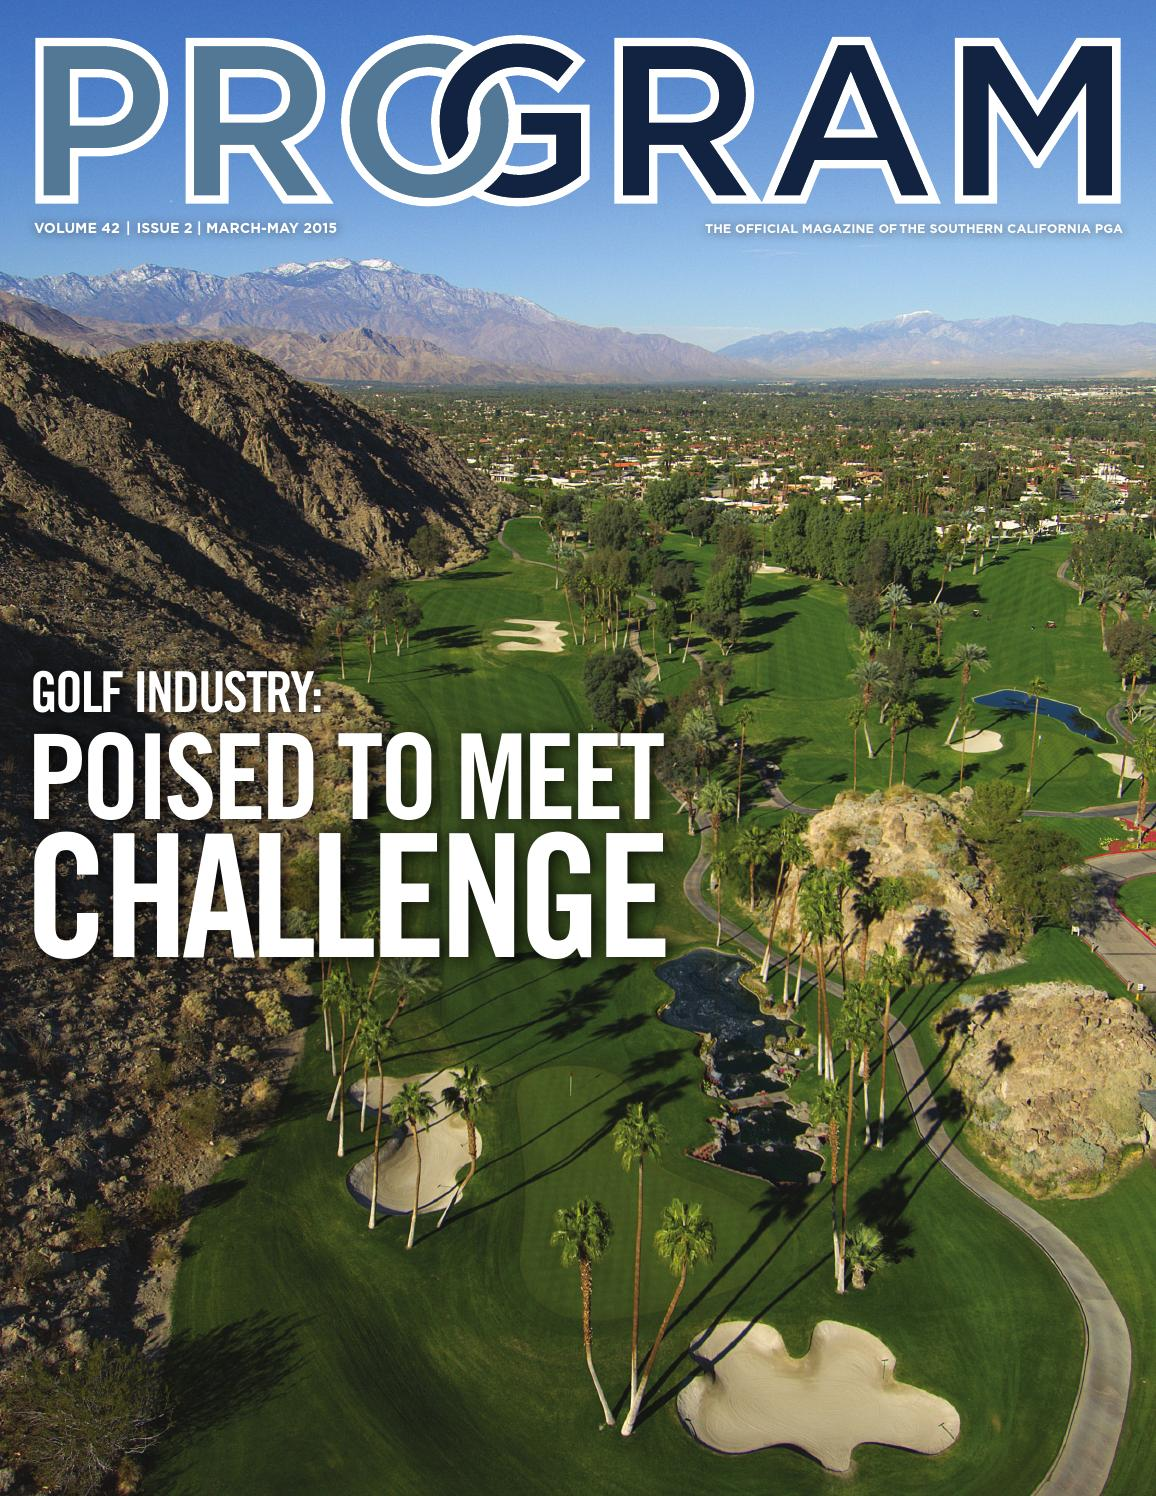 Southern California PGA PROgram Magazine - 2015 March-May